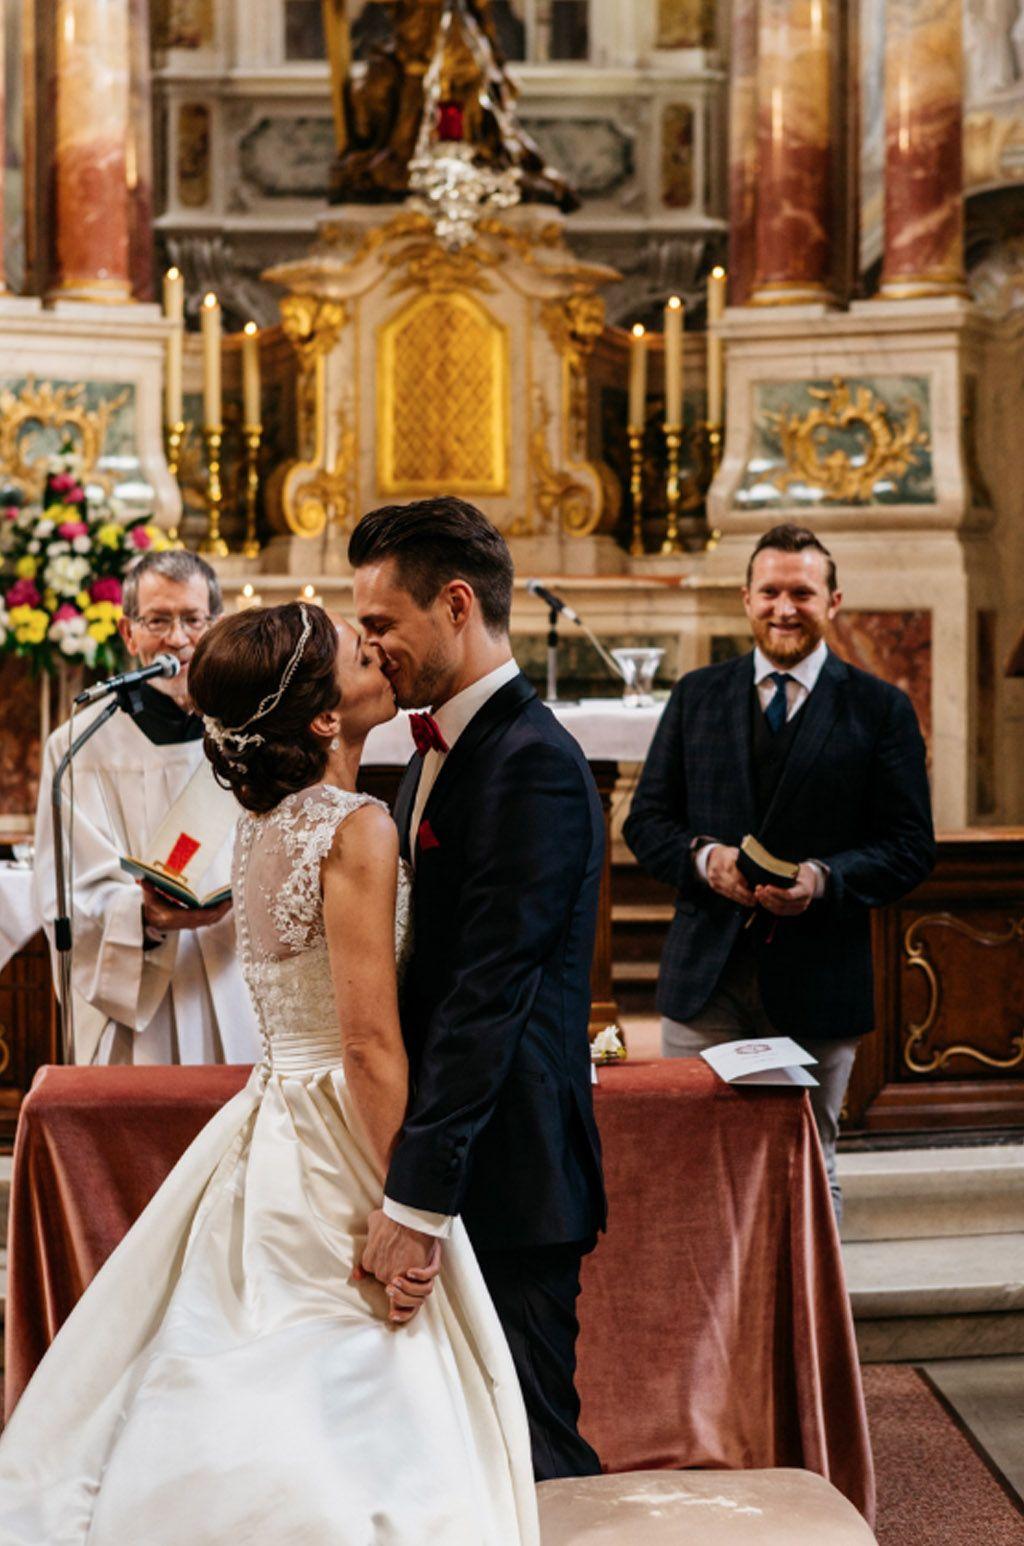 Traditional german wedding ceremony